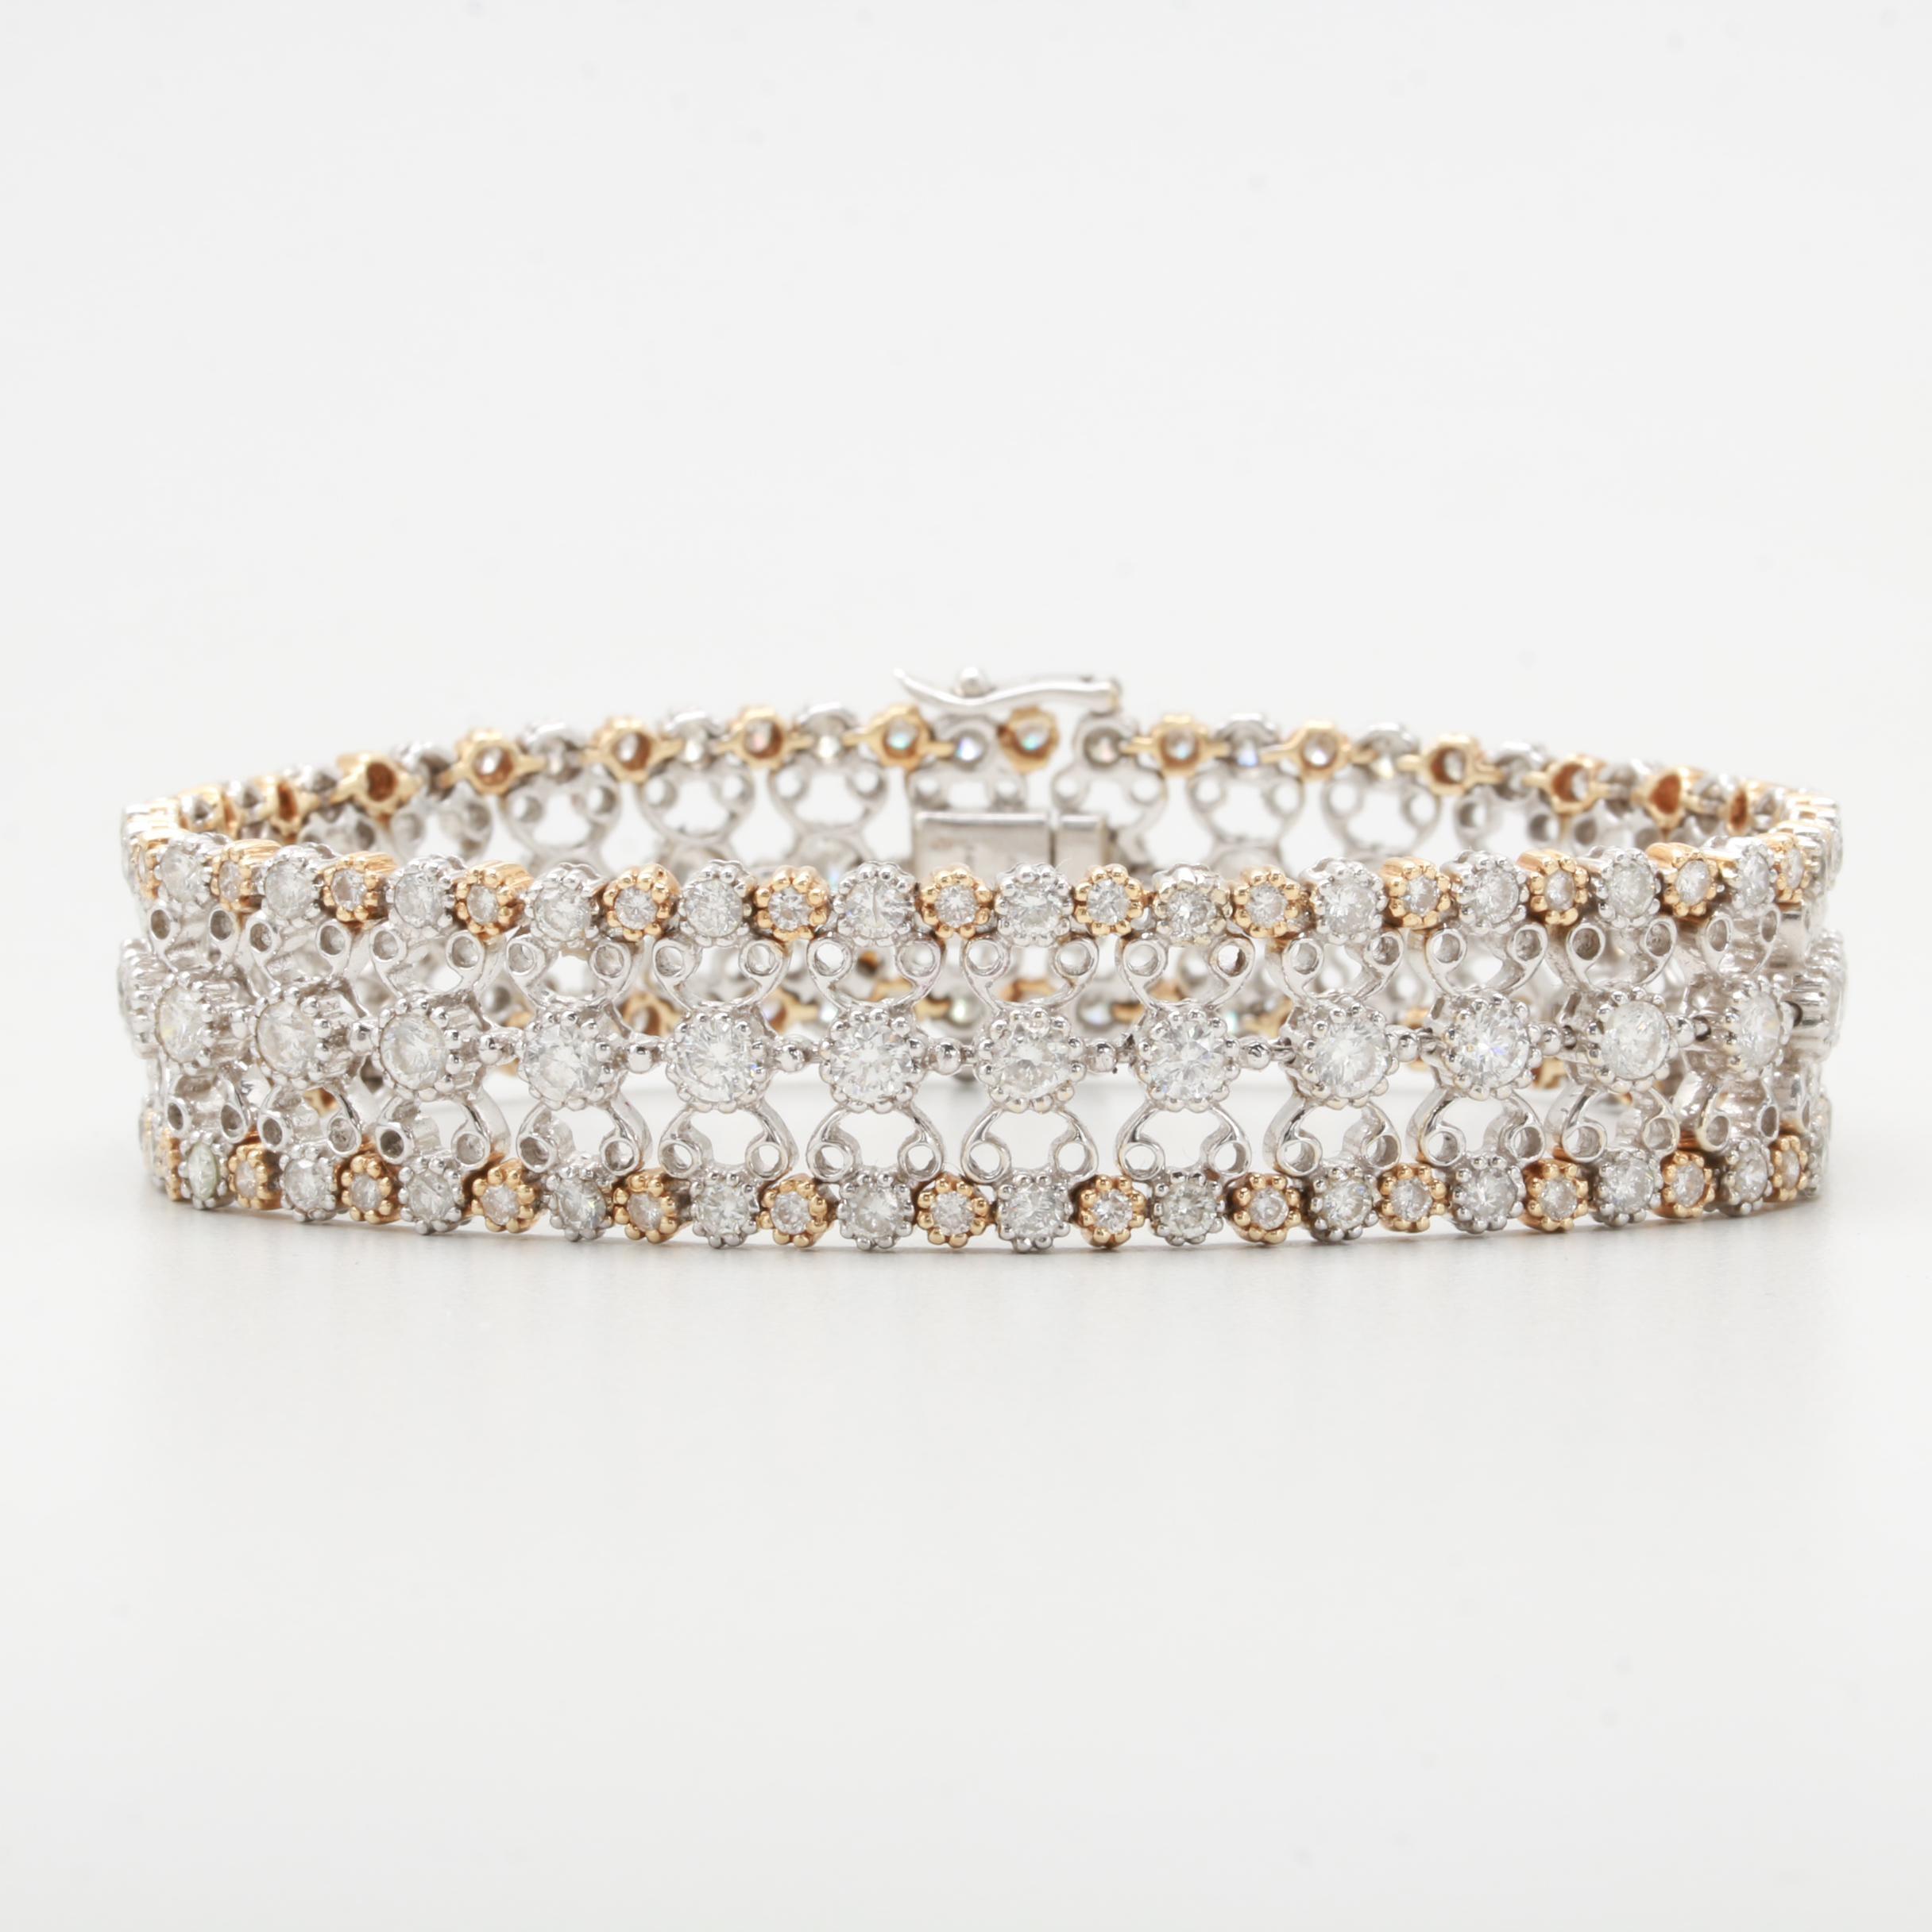 Ciemme Jewels Limited 14K White and Yellow Gold 5.88 CTW Diamond Bracelet